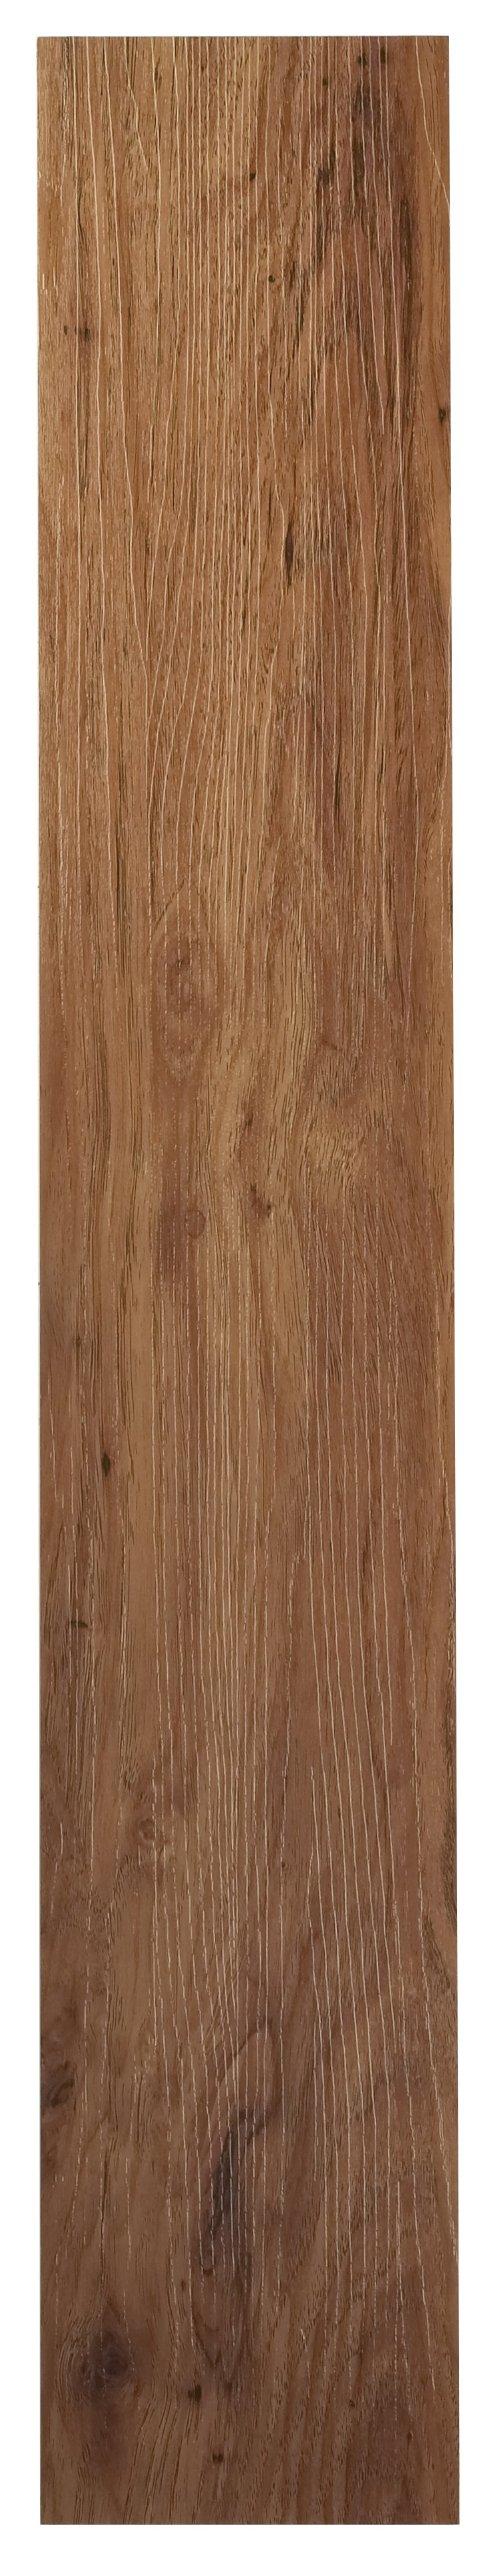 Best Rated In Wood Flooring Amp Helpful Customer Reviews